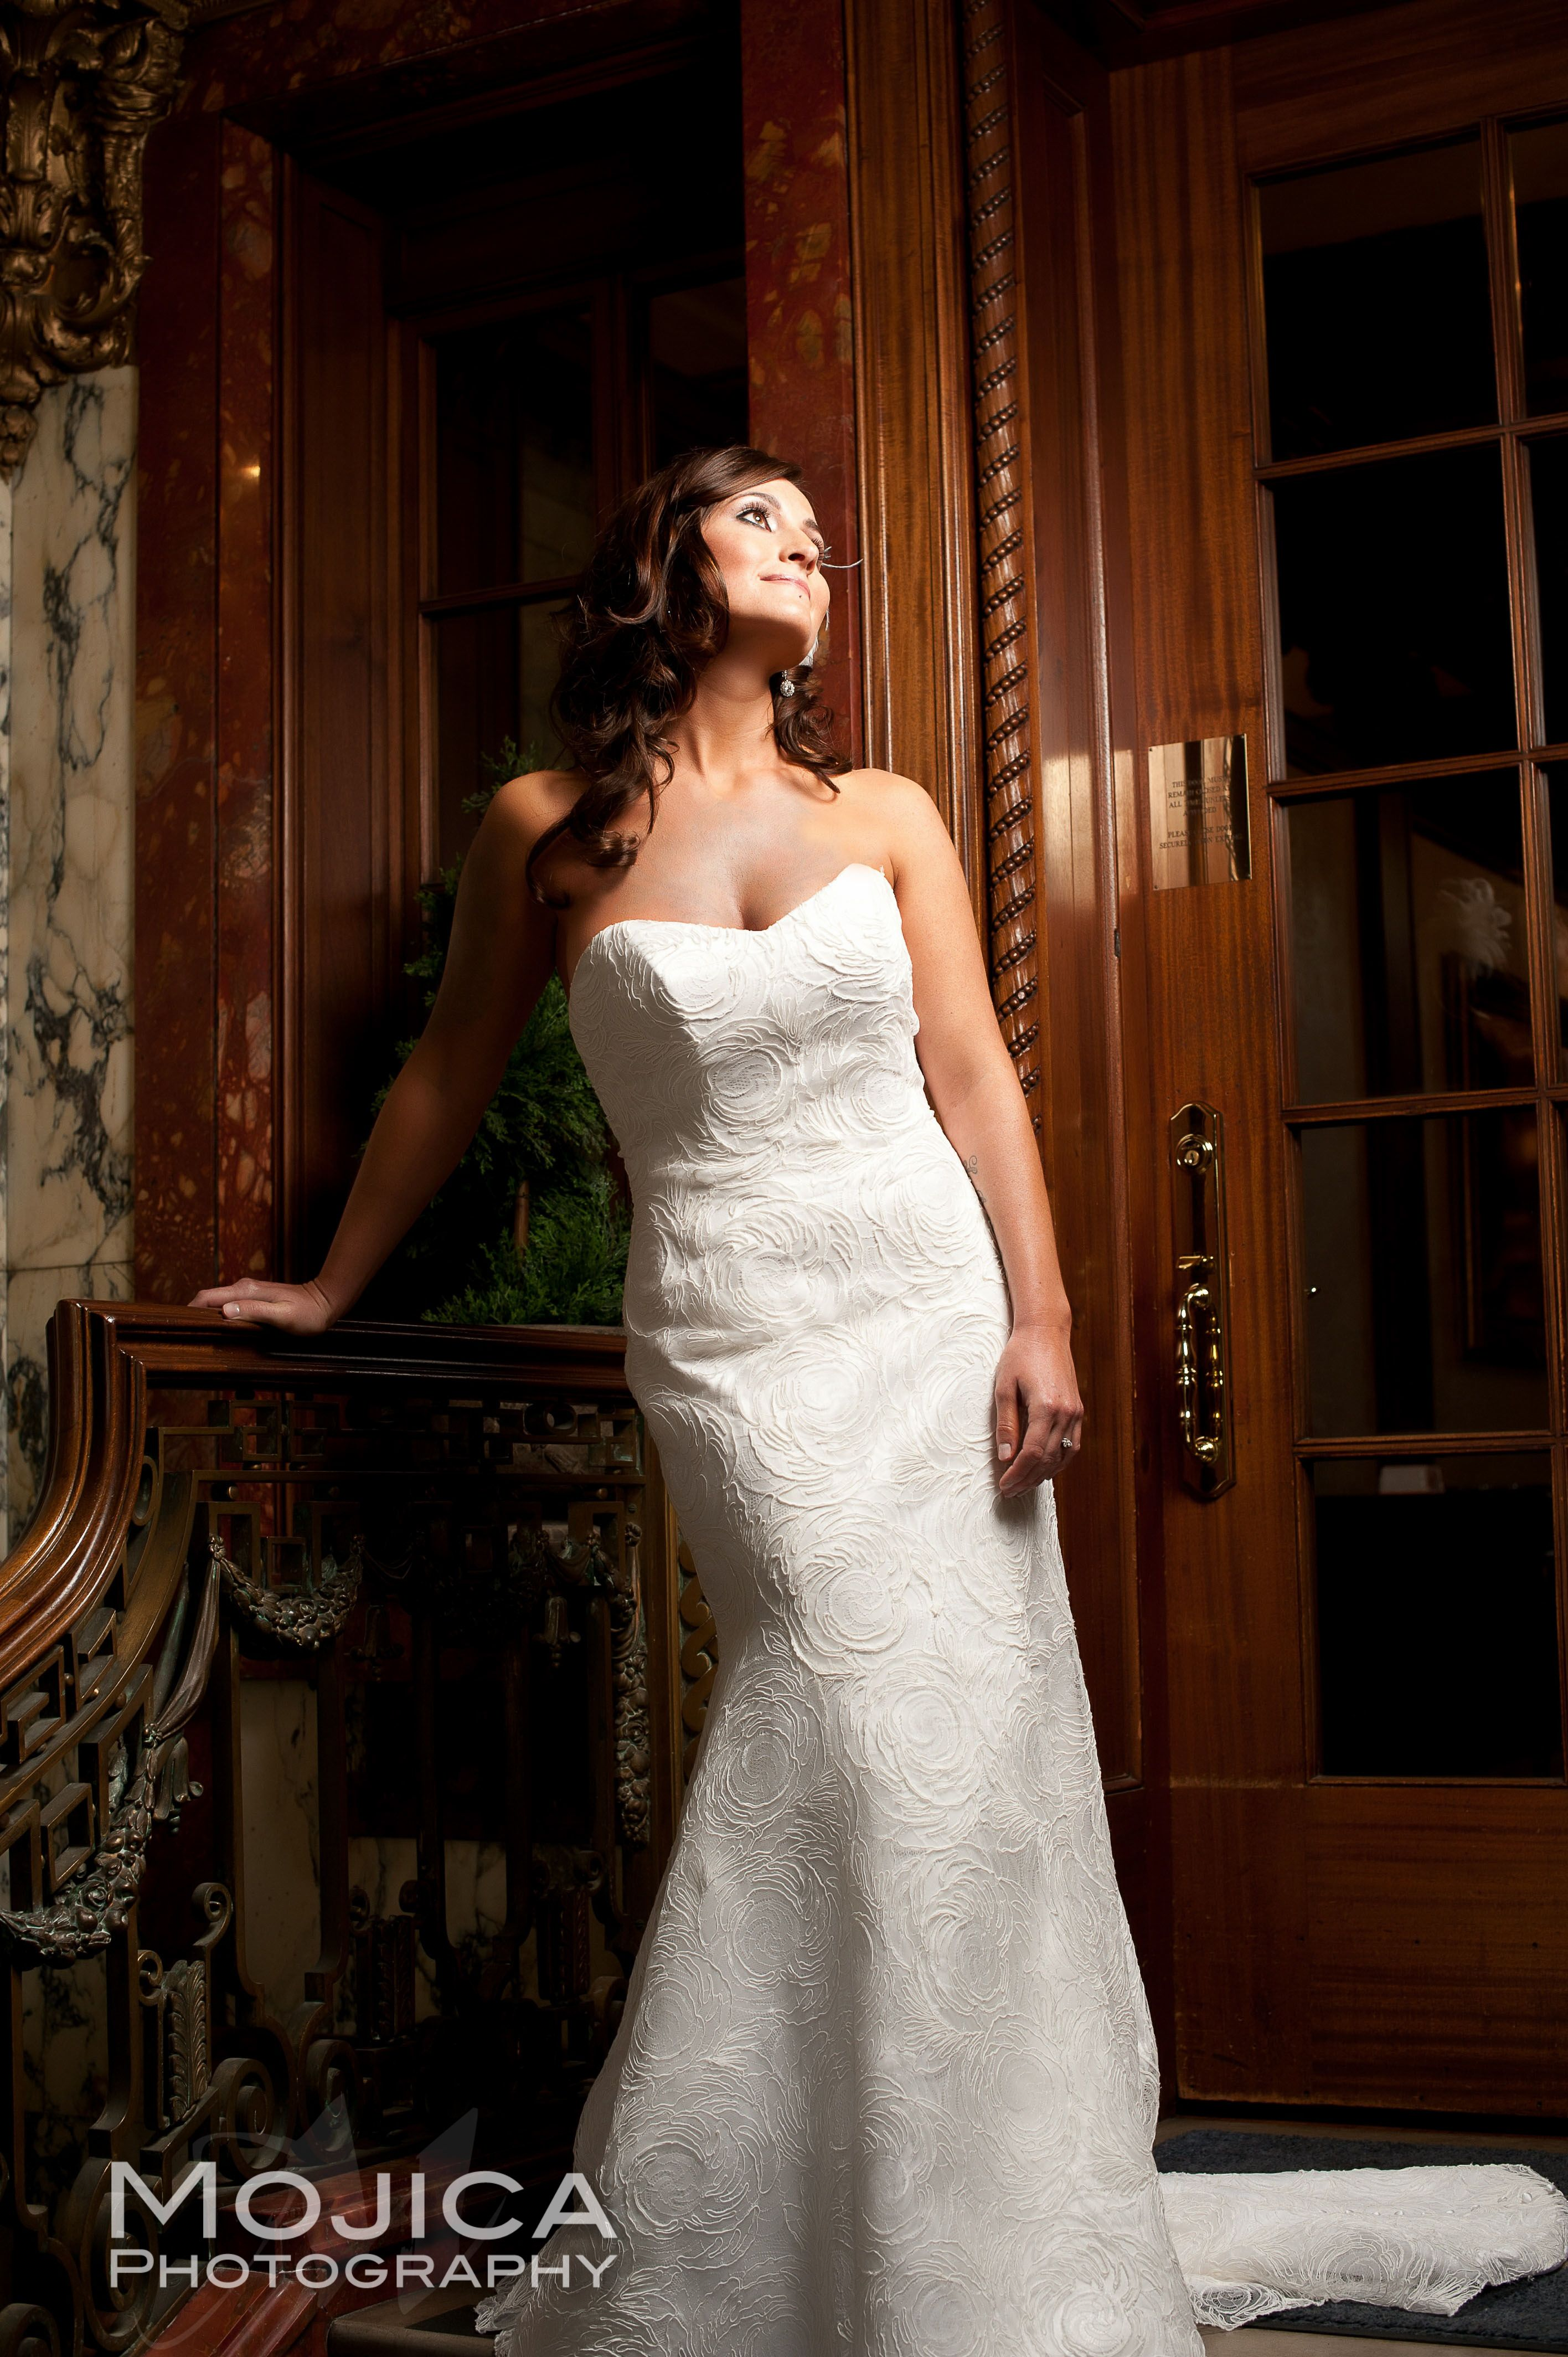 Altar Bridal Wedding dress Loose Mansion Venue